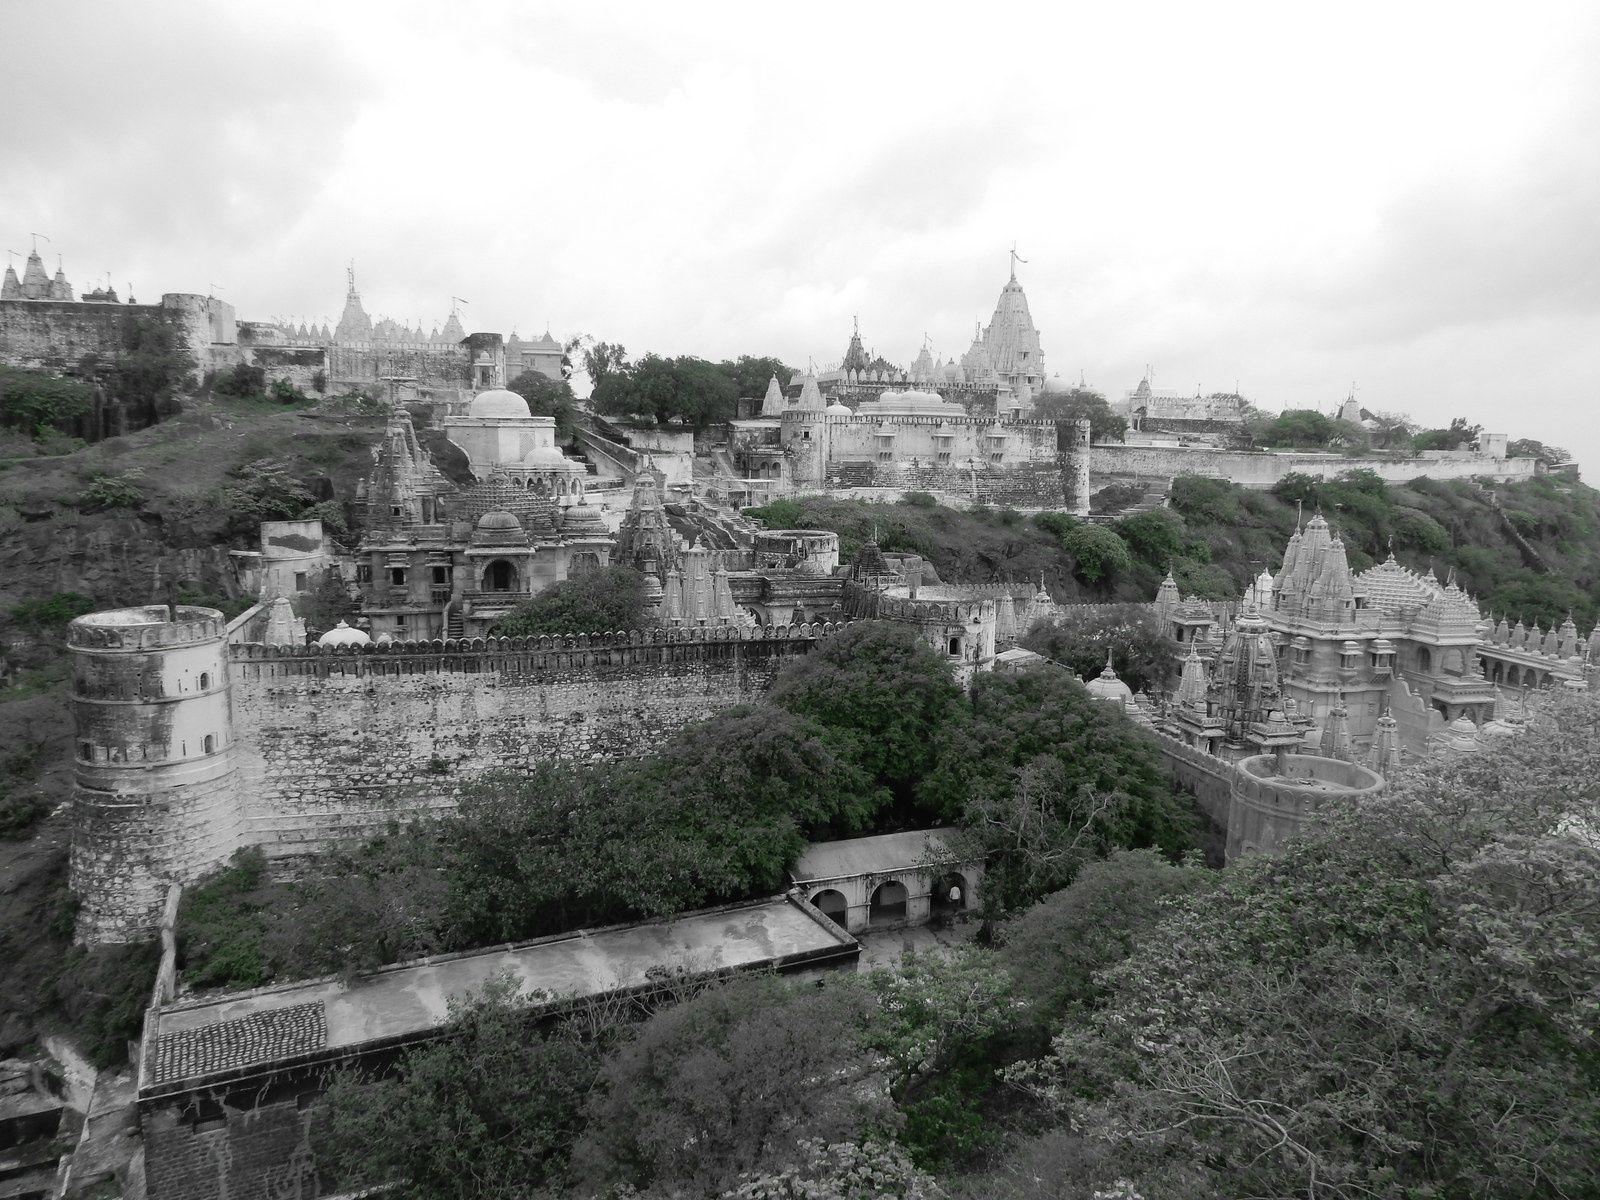 Palitana, Gujarat - Juillet 2014